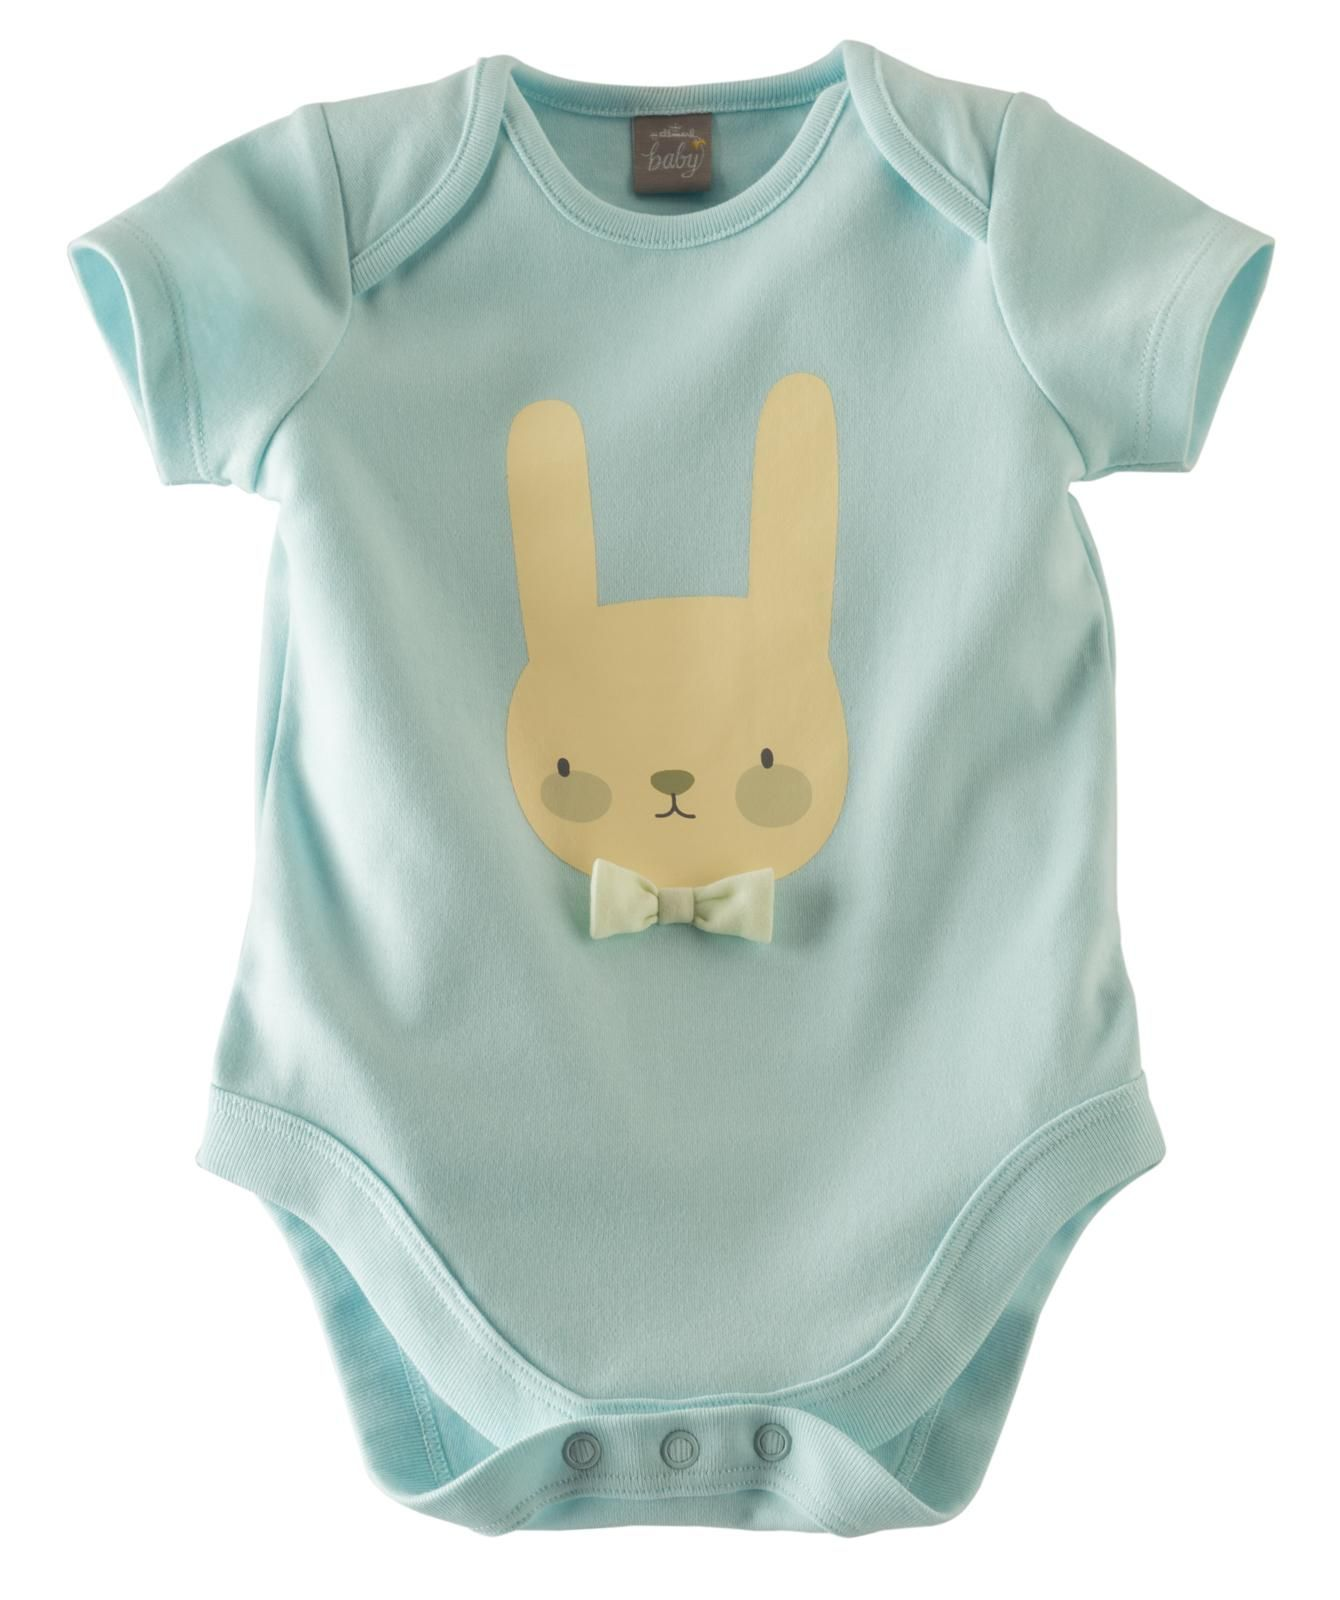 Sleepy Bunny Body Suit Blue